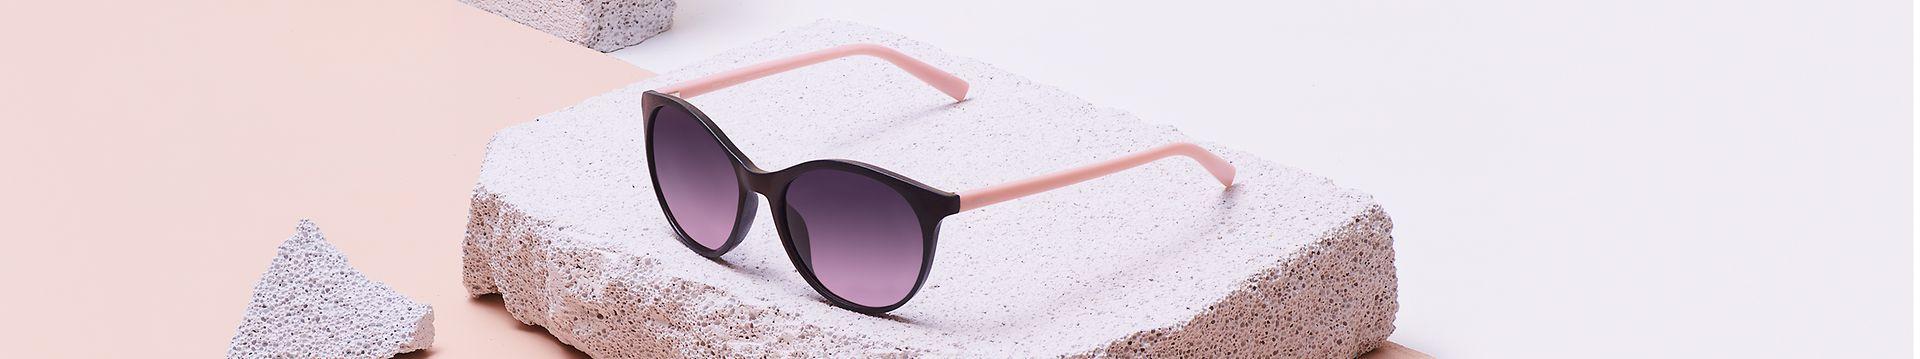 112021 - Women - tc banner - occhiali da sole (1)